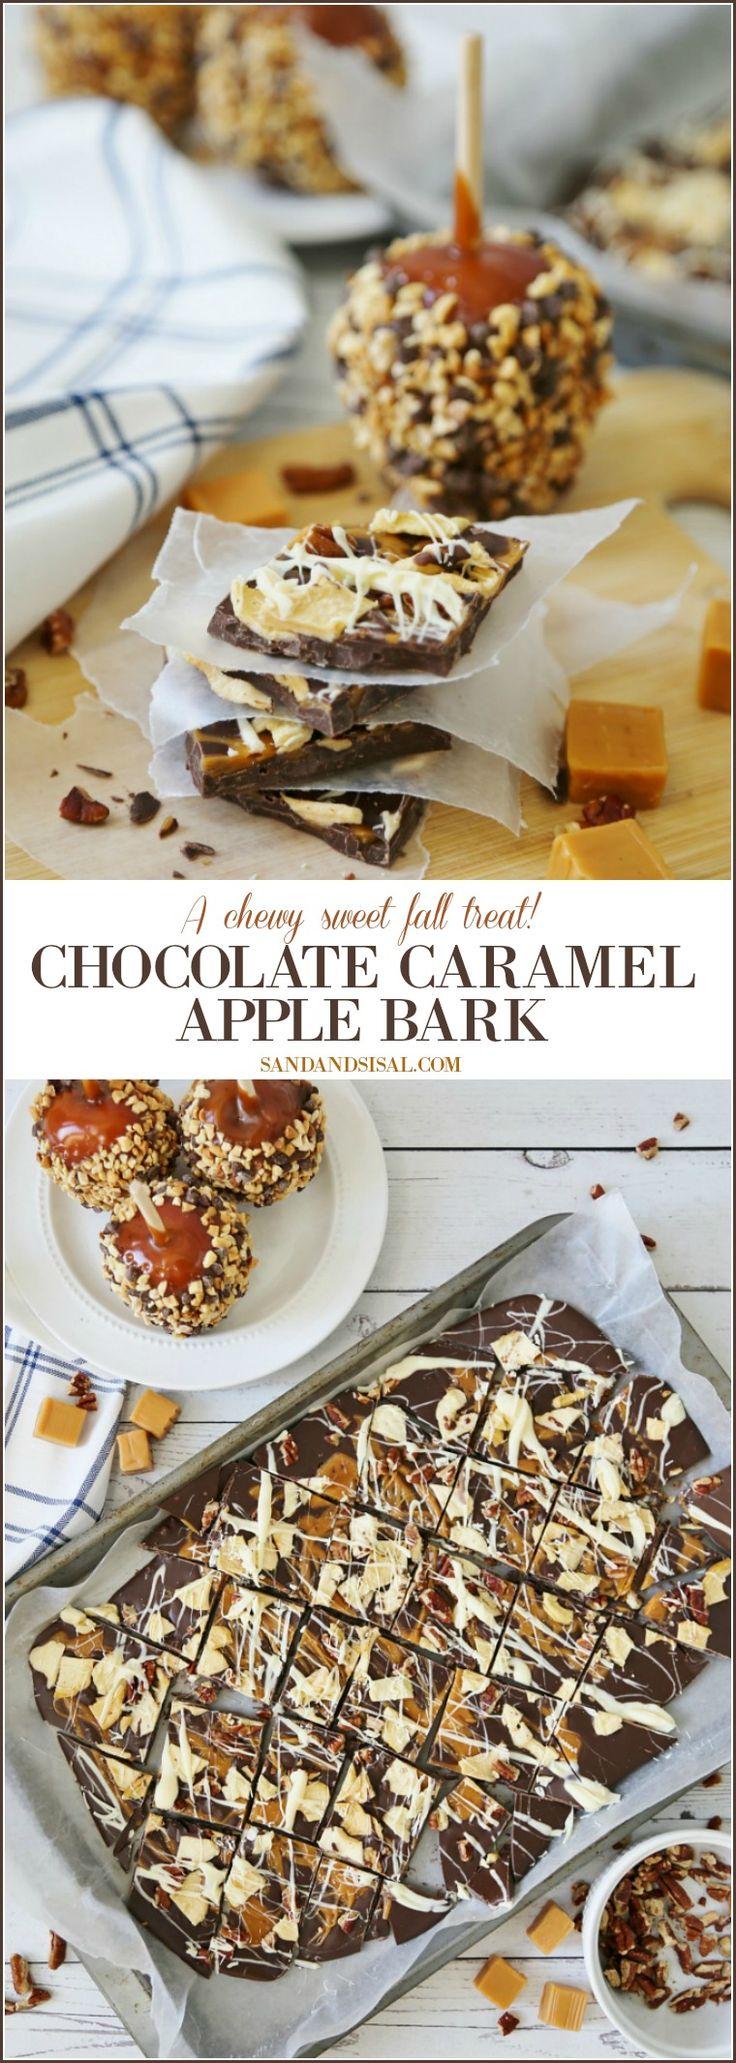 Chocolate Caramel Apple Bark Recipe